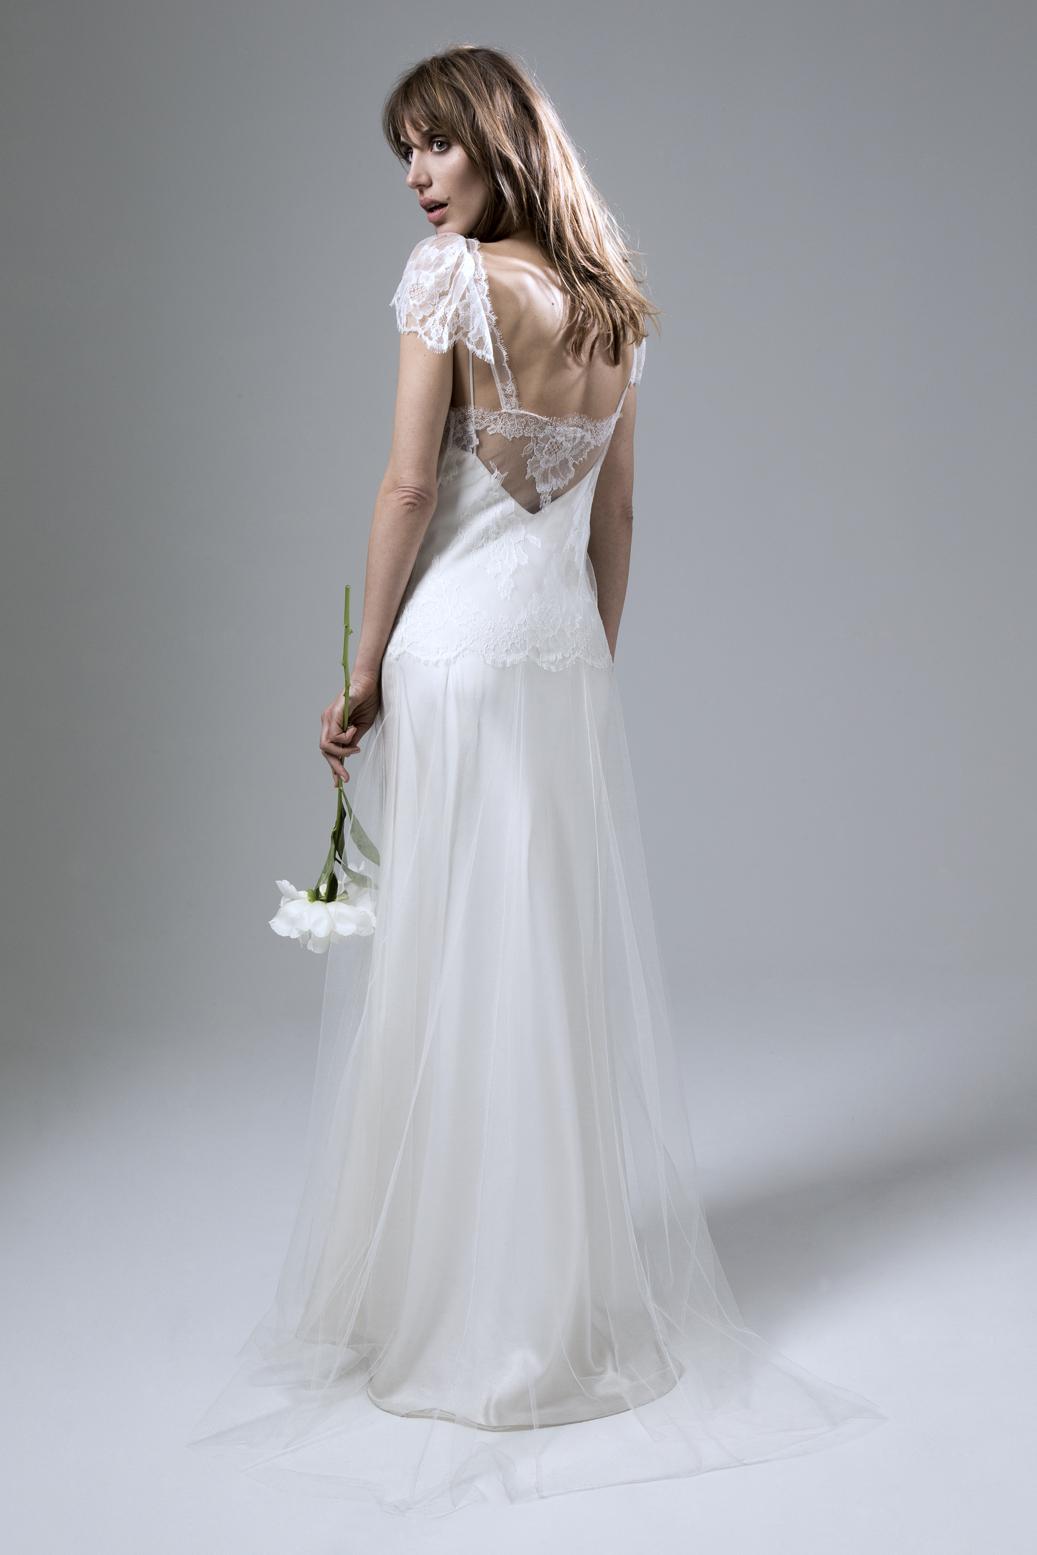 FIFI lace cap sleeve wedding dress by Halfpenny London